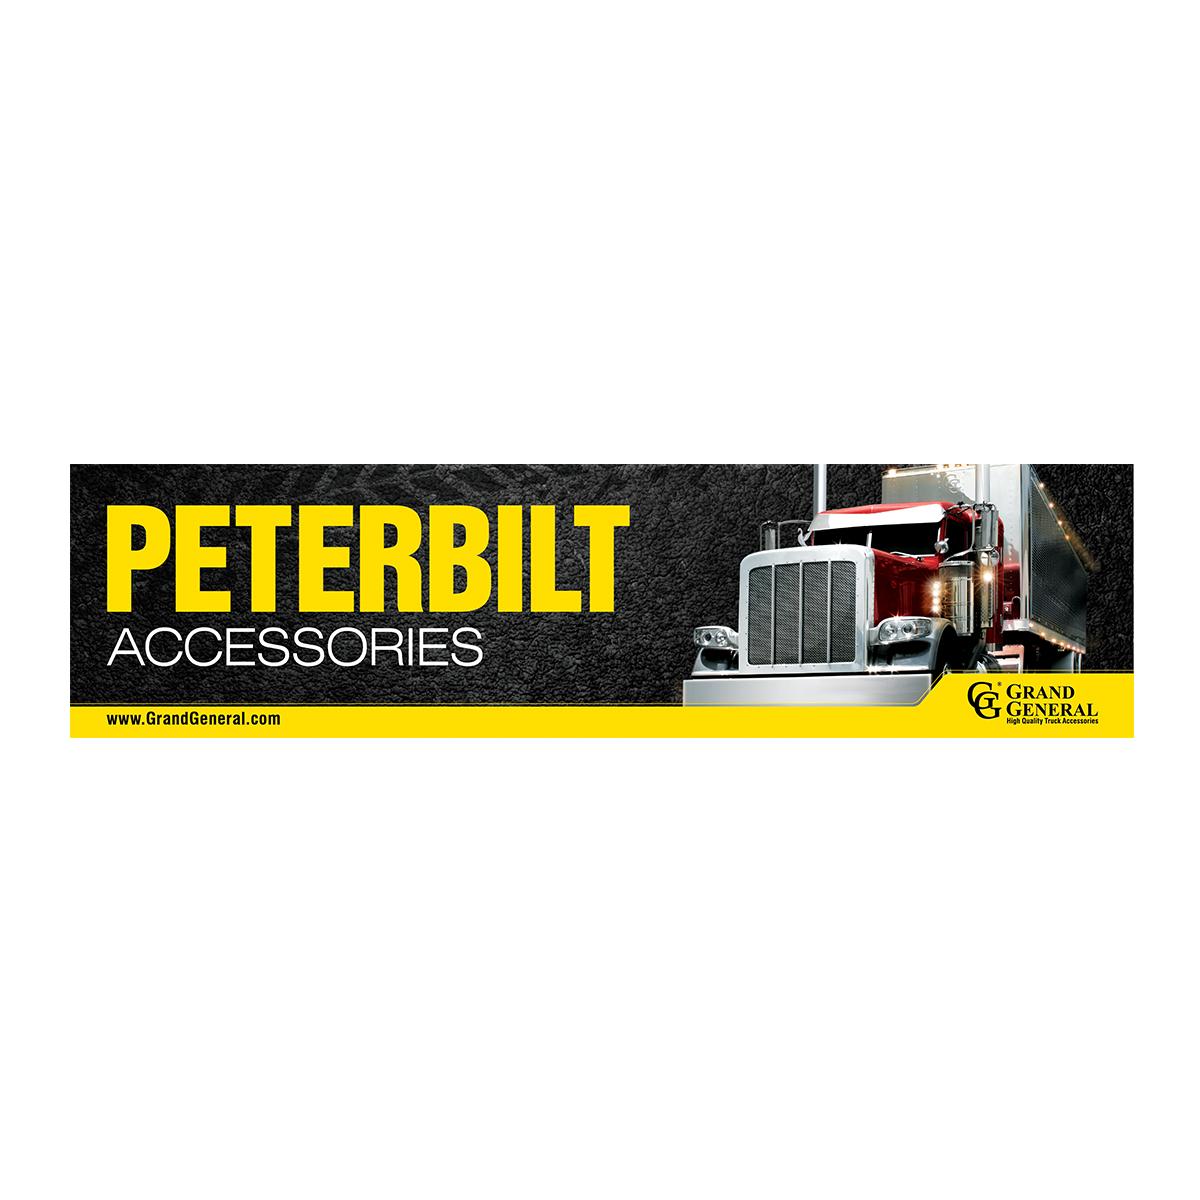 Peterbilt Accessories Display Sign